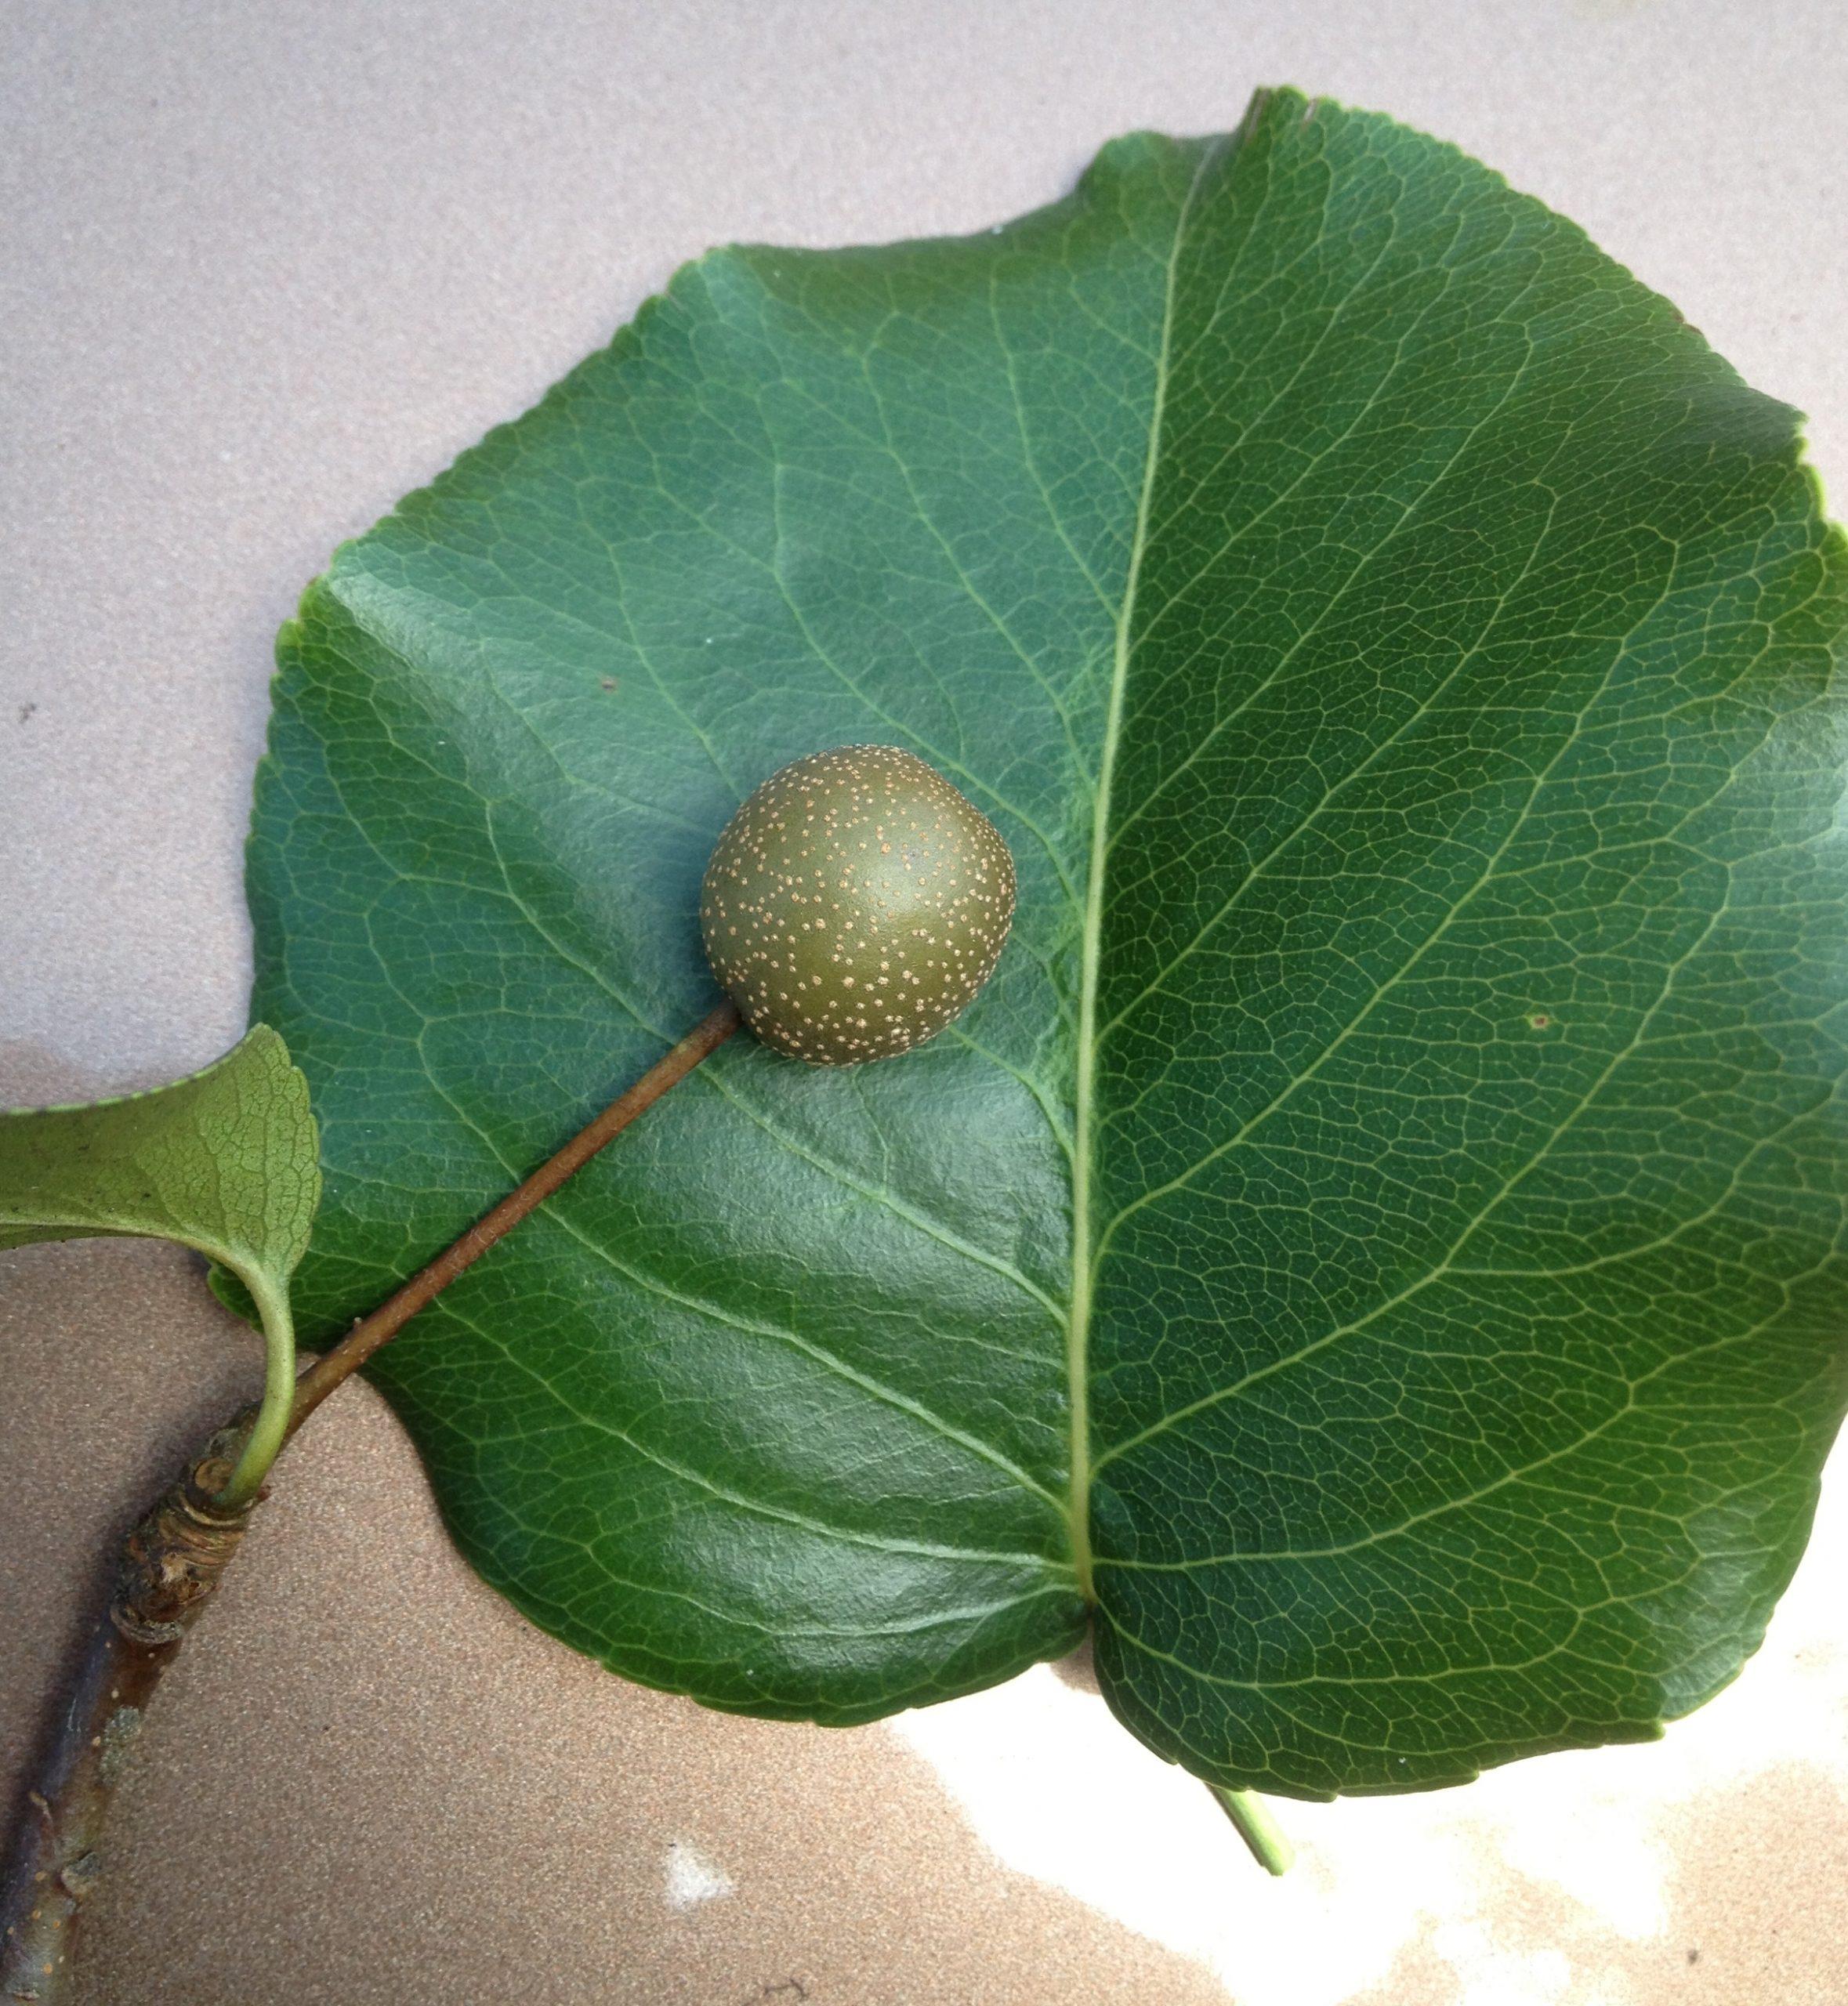 Bradford pear fruit